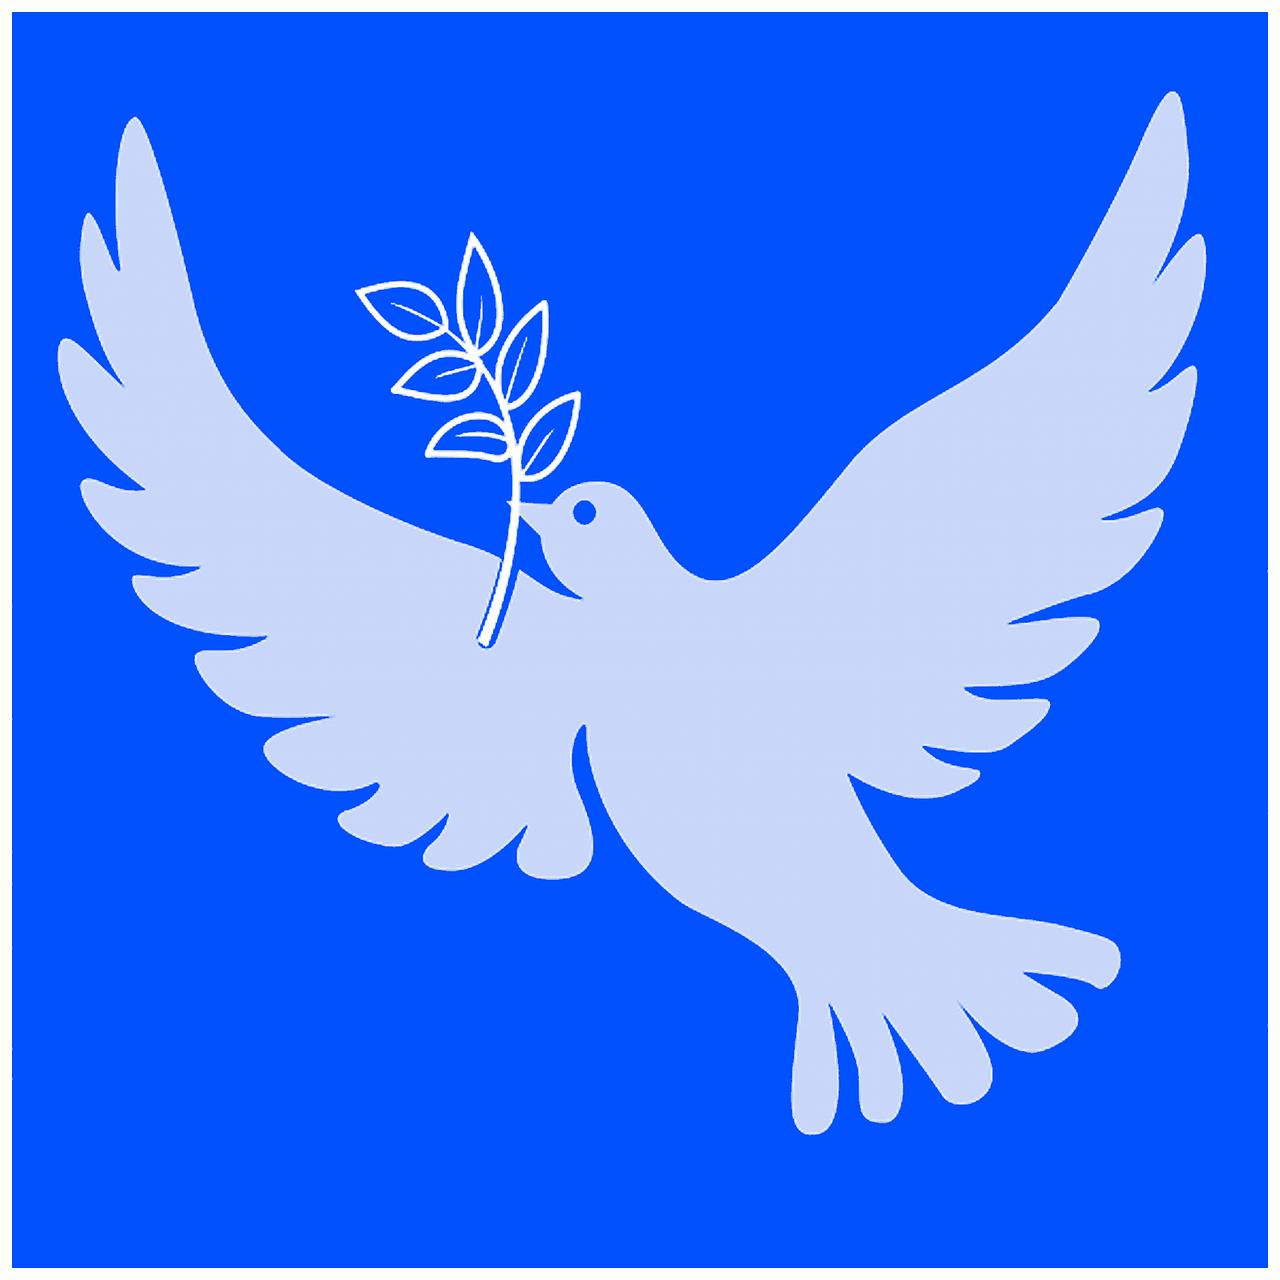 dove-of-peace-2332907_1280